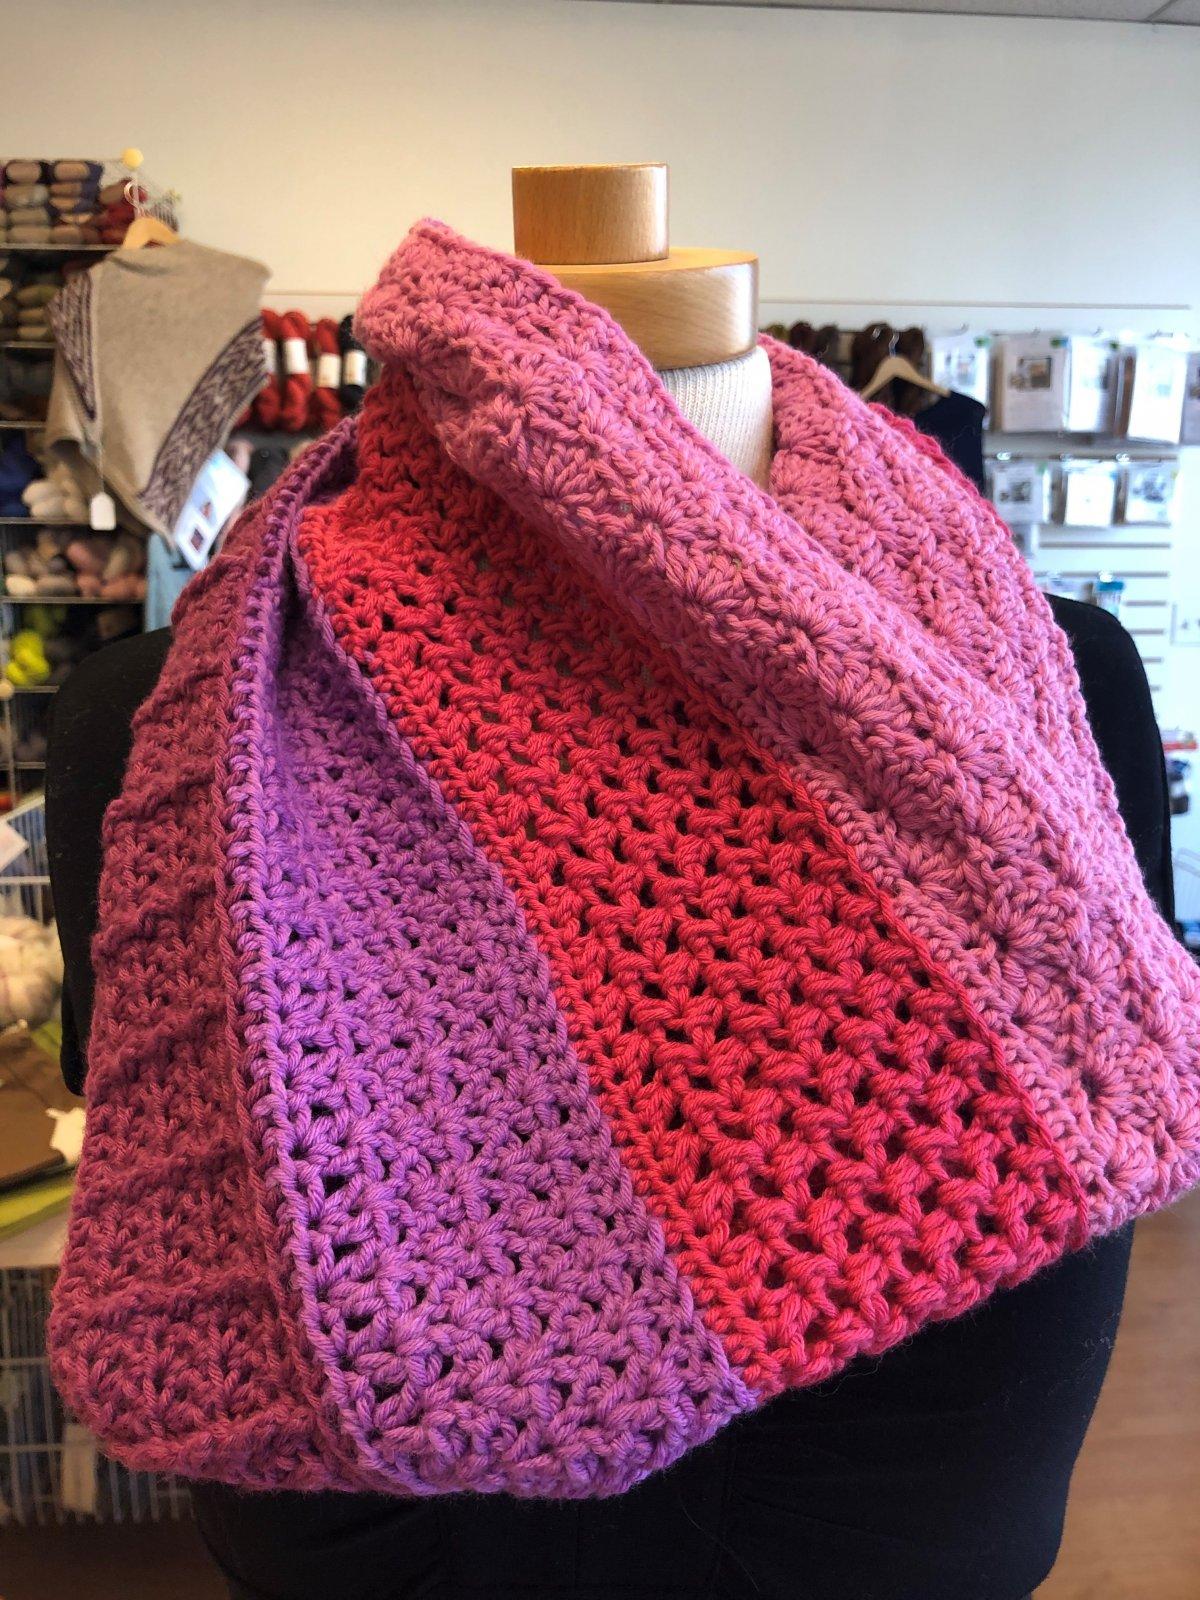 Quartet in Color-Crochet Edition